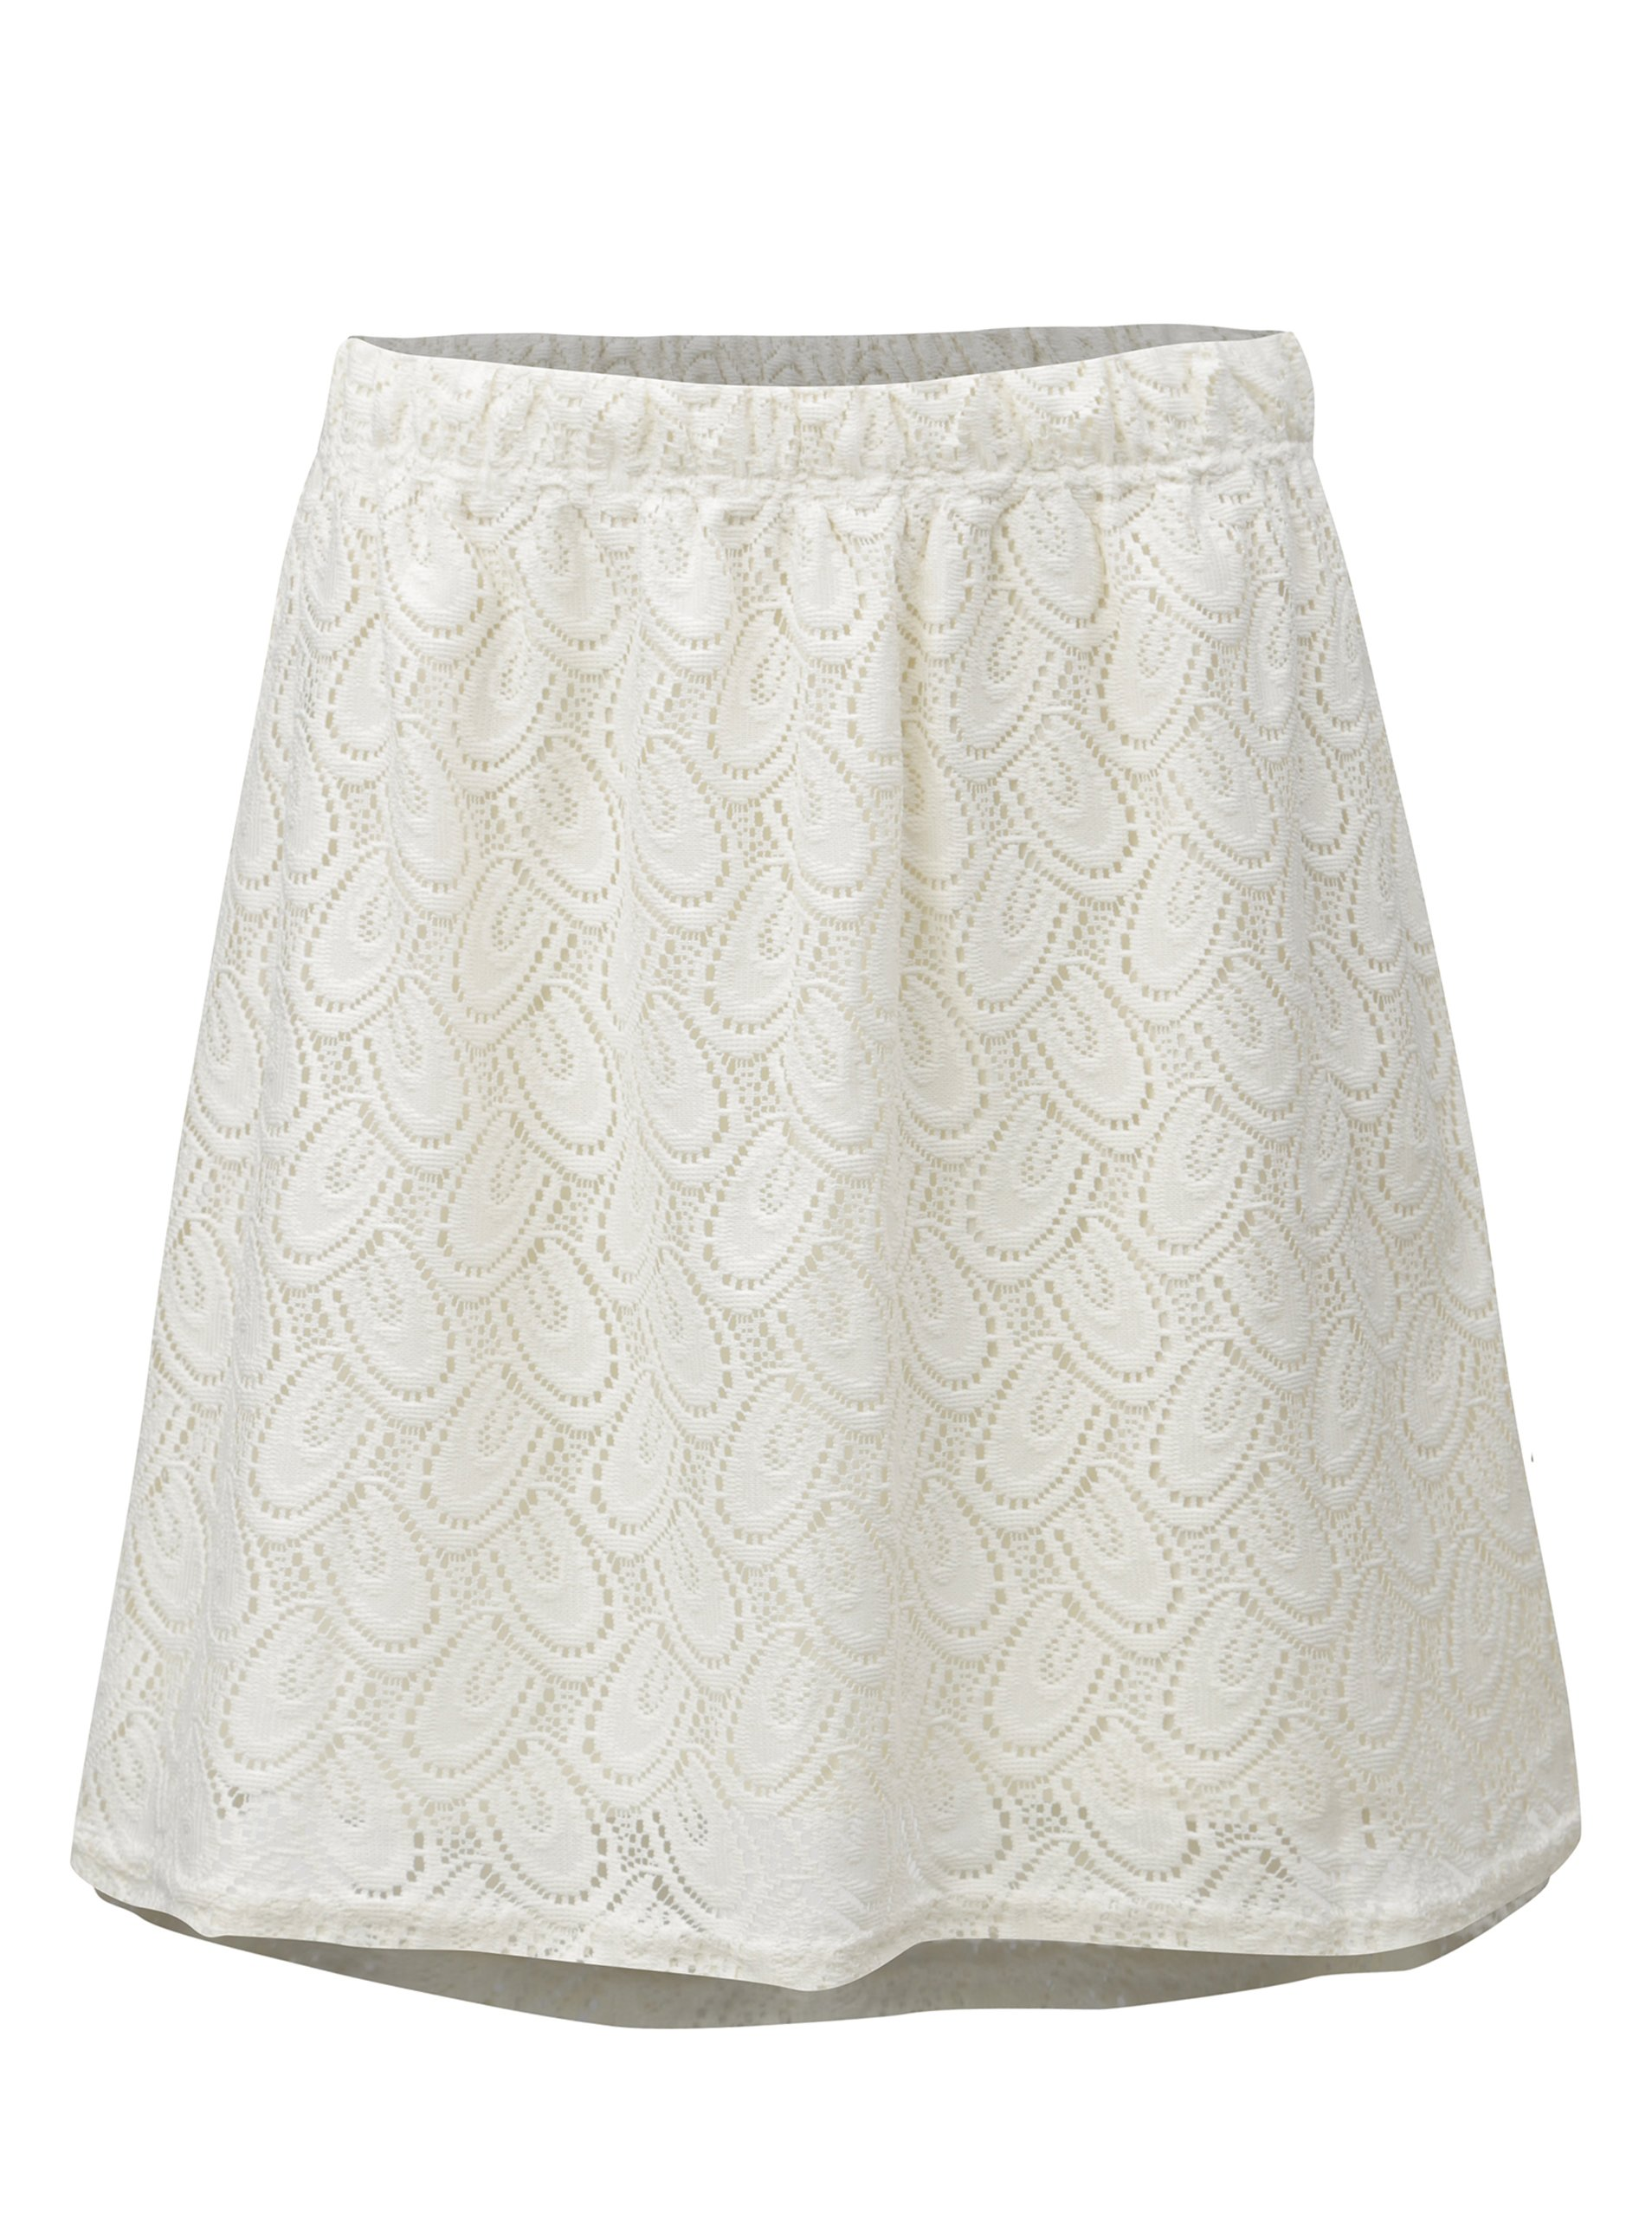 d06c3861253c Krémová čipkovaná sukňa Jacqueline de Yong Cart